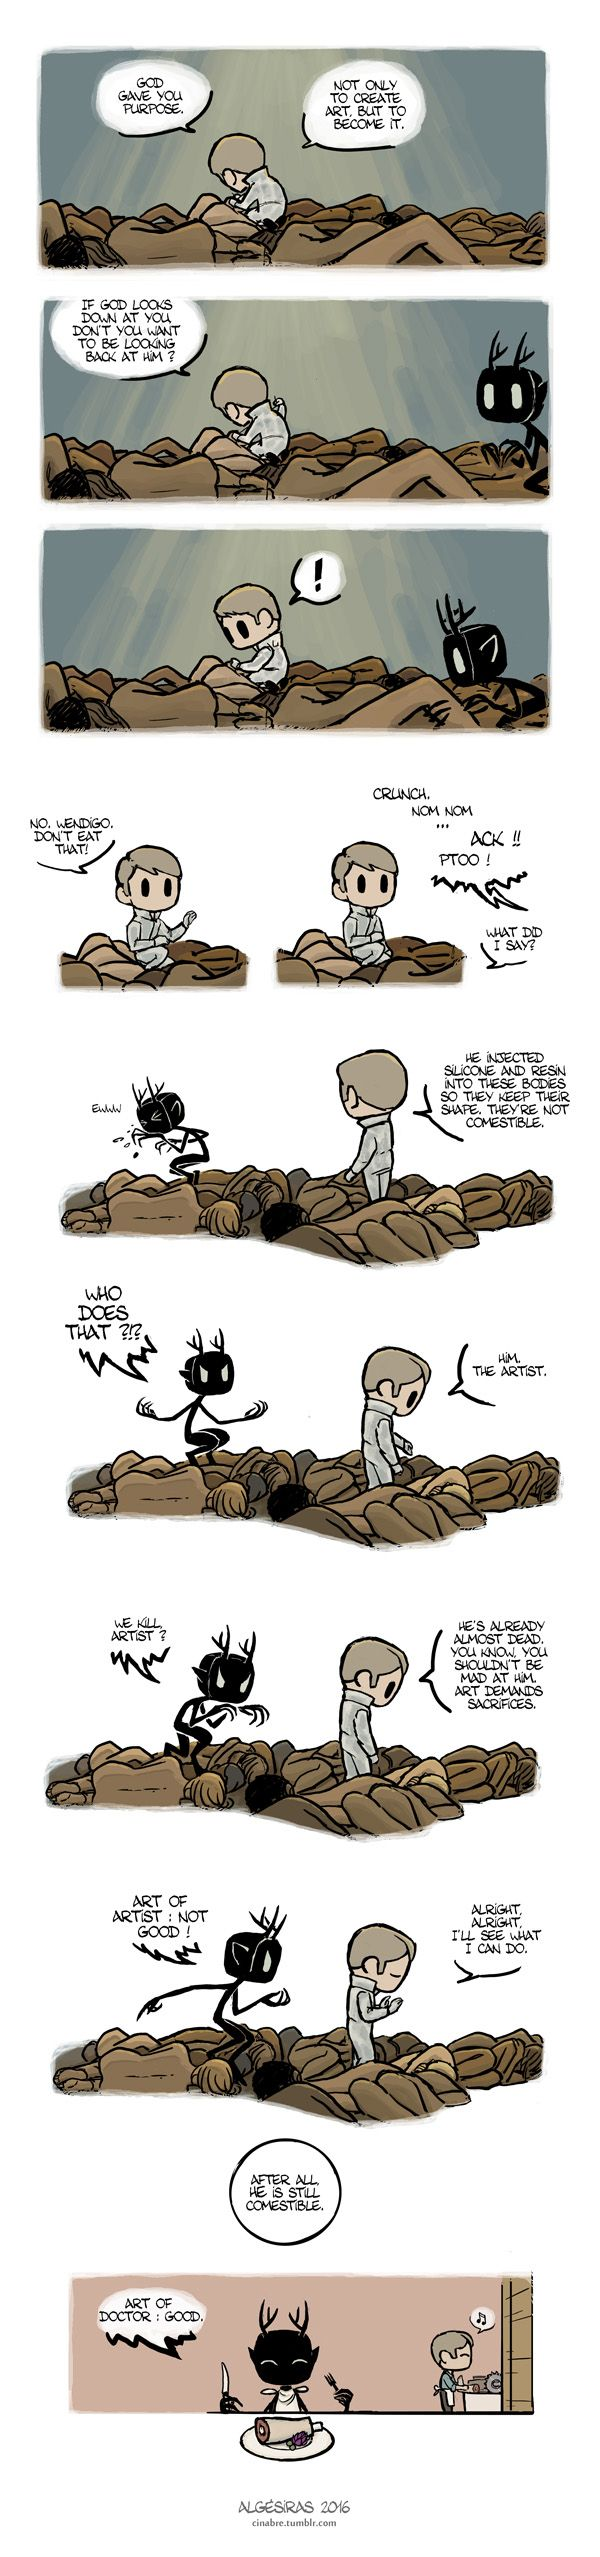 Pet Wendigo strip 20 : A matter of taste by Algesiras.deviantart.com on @DeviantArt